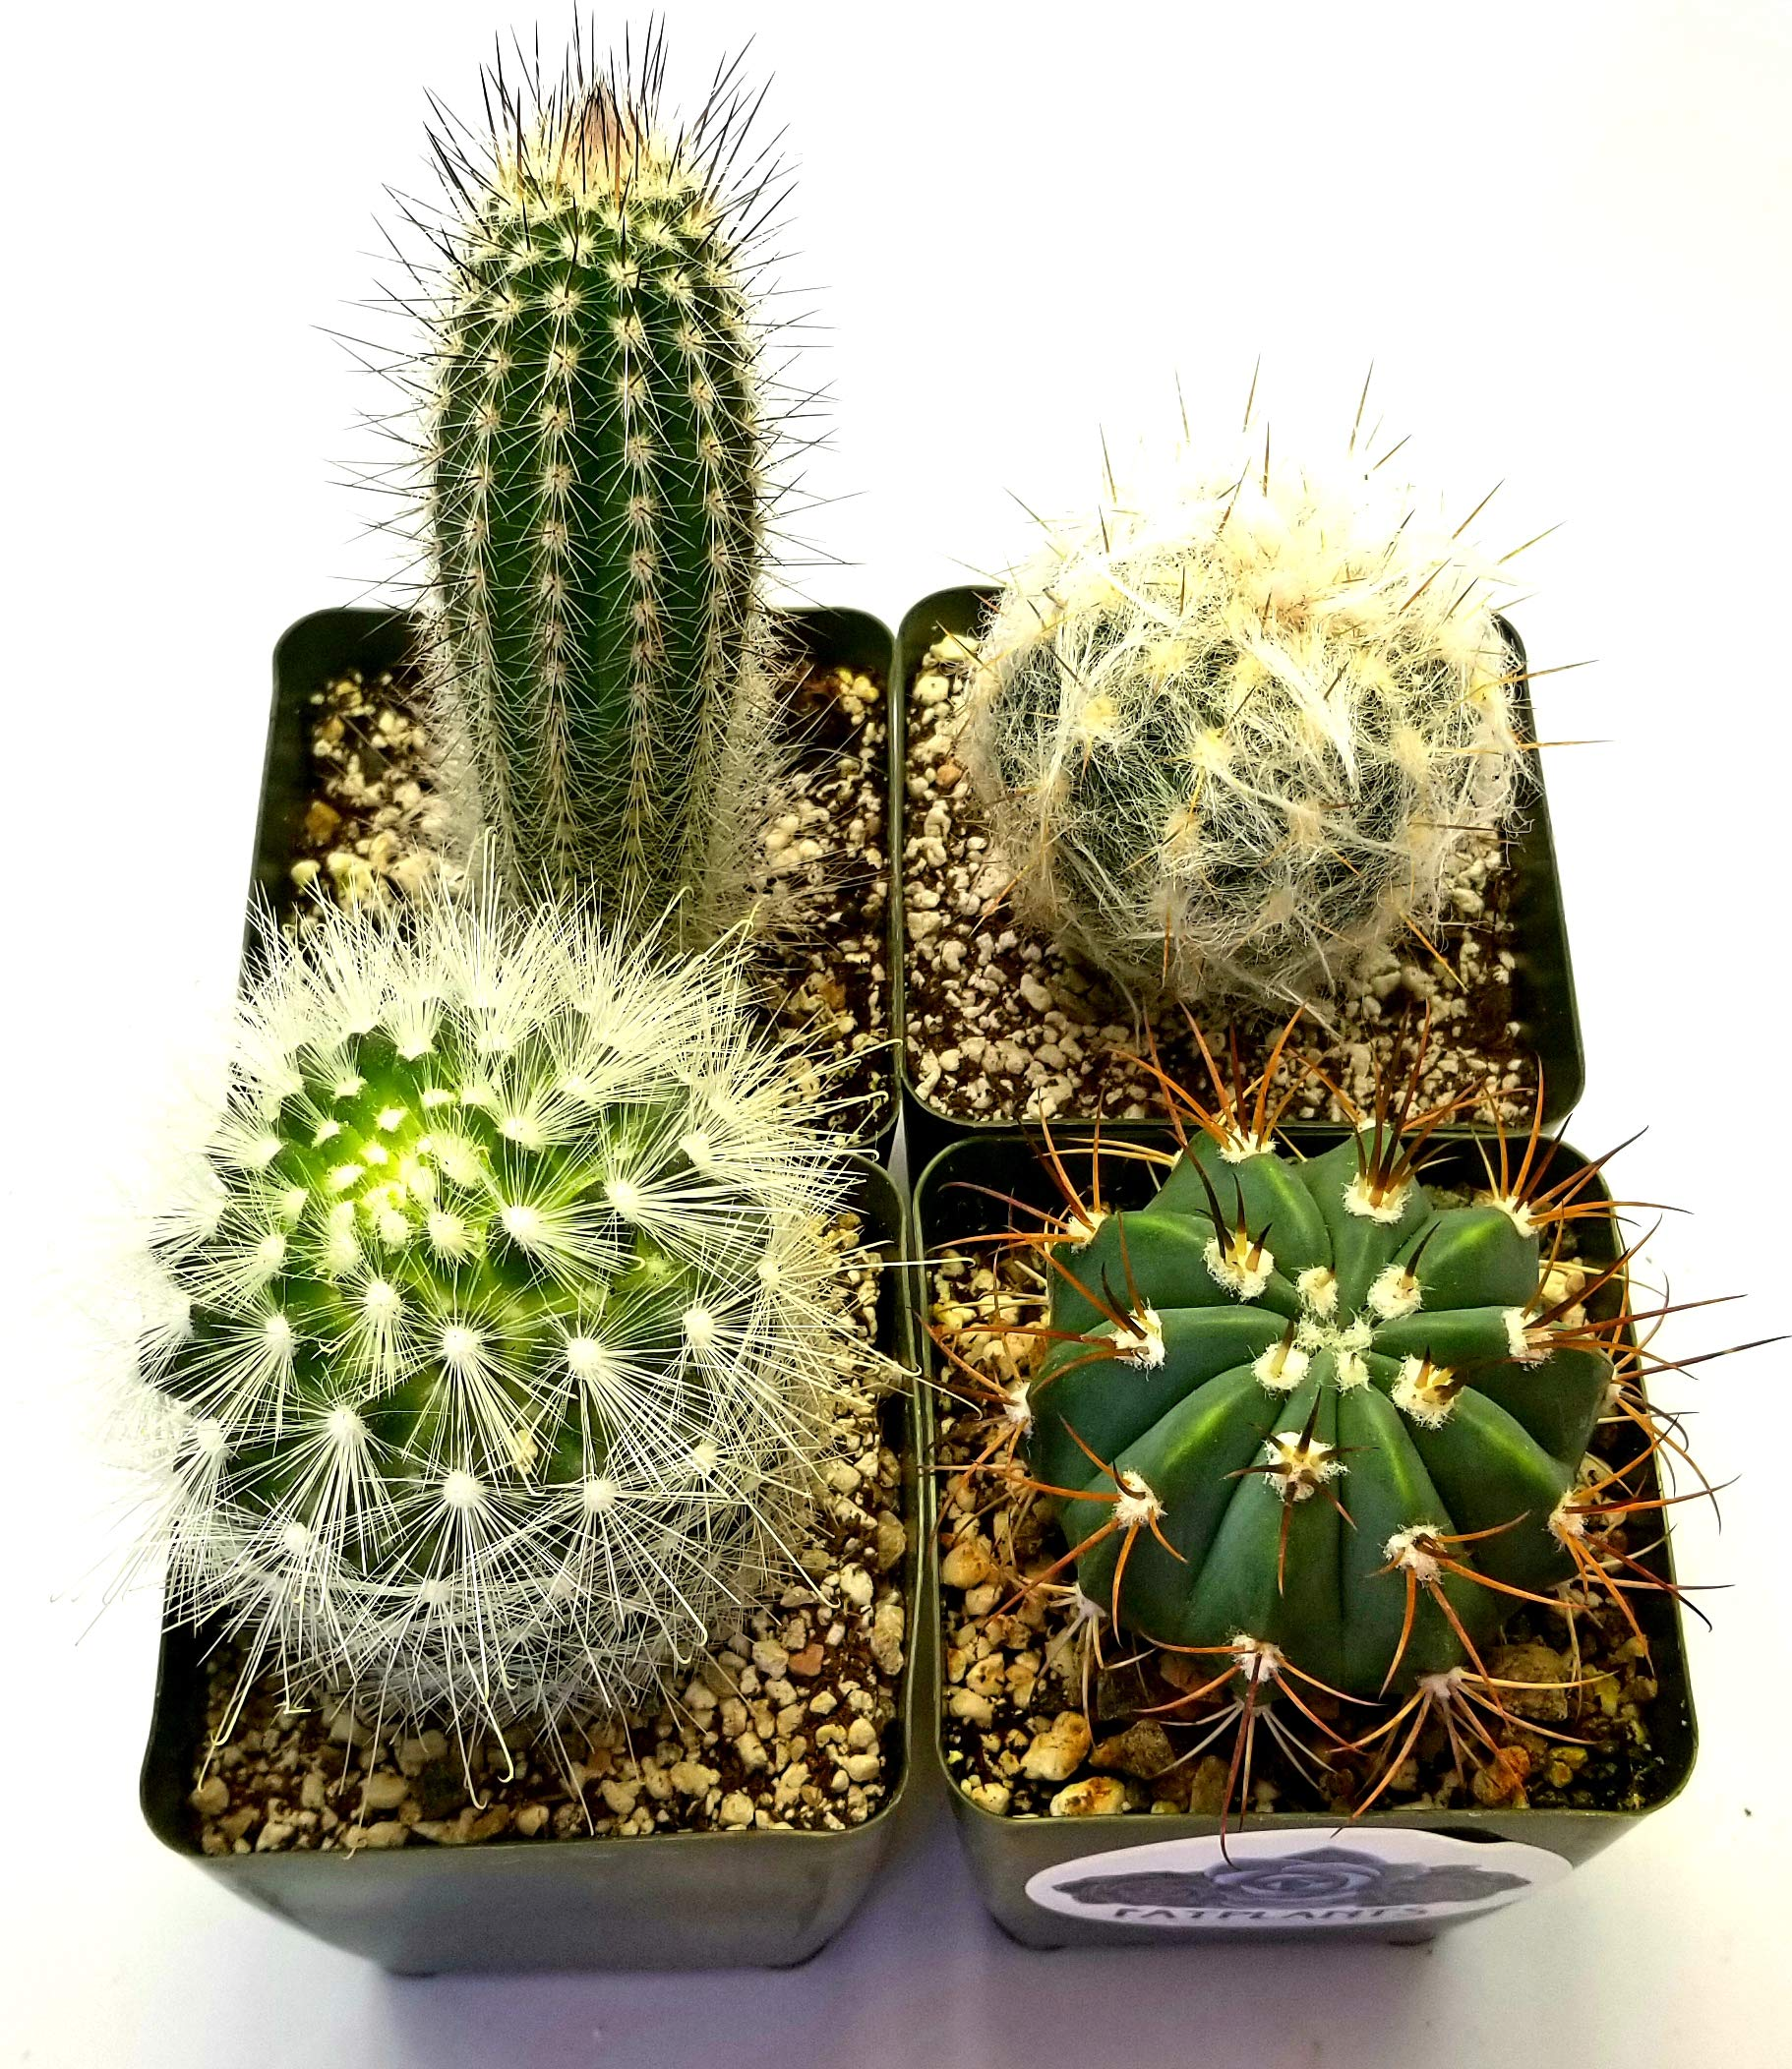 Fat Plants San Diego Large Cactus Plant(s) (2) by Fat Plants San Diego (Image #2)